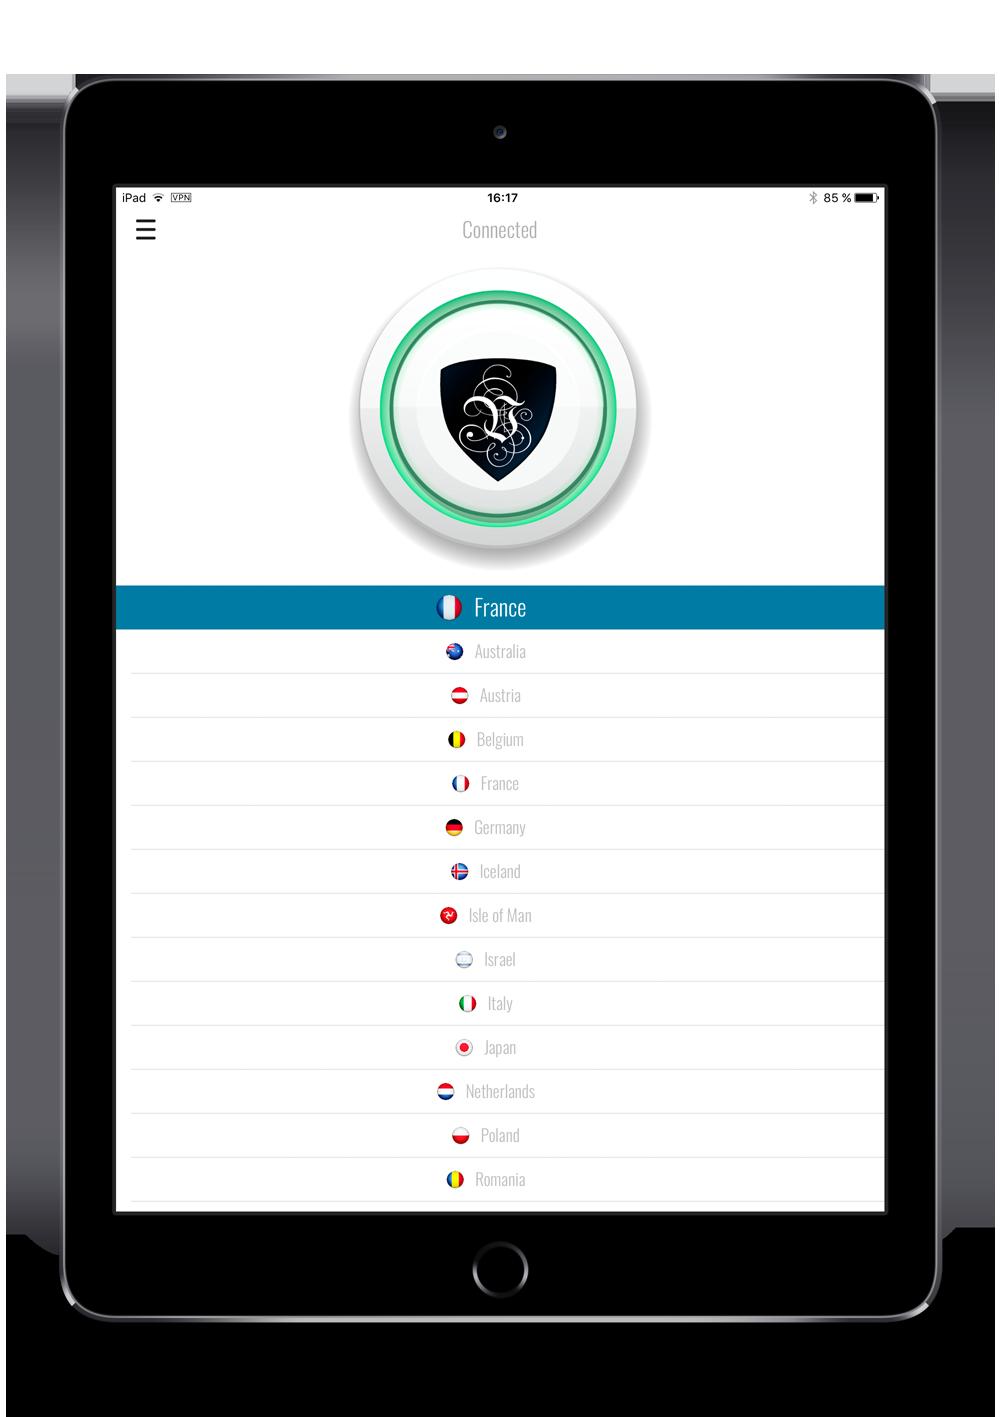 Le VPN for iPad | VPN app for iPad | The best VPN for iPad | best VPN app for iPad | VPN apps for iPad